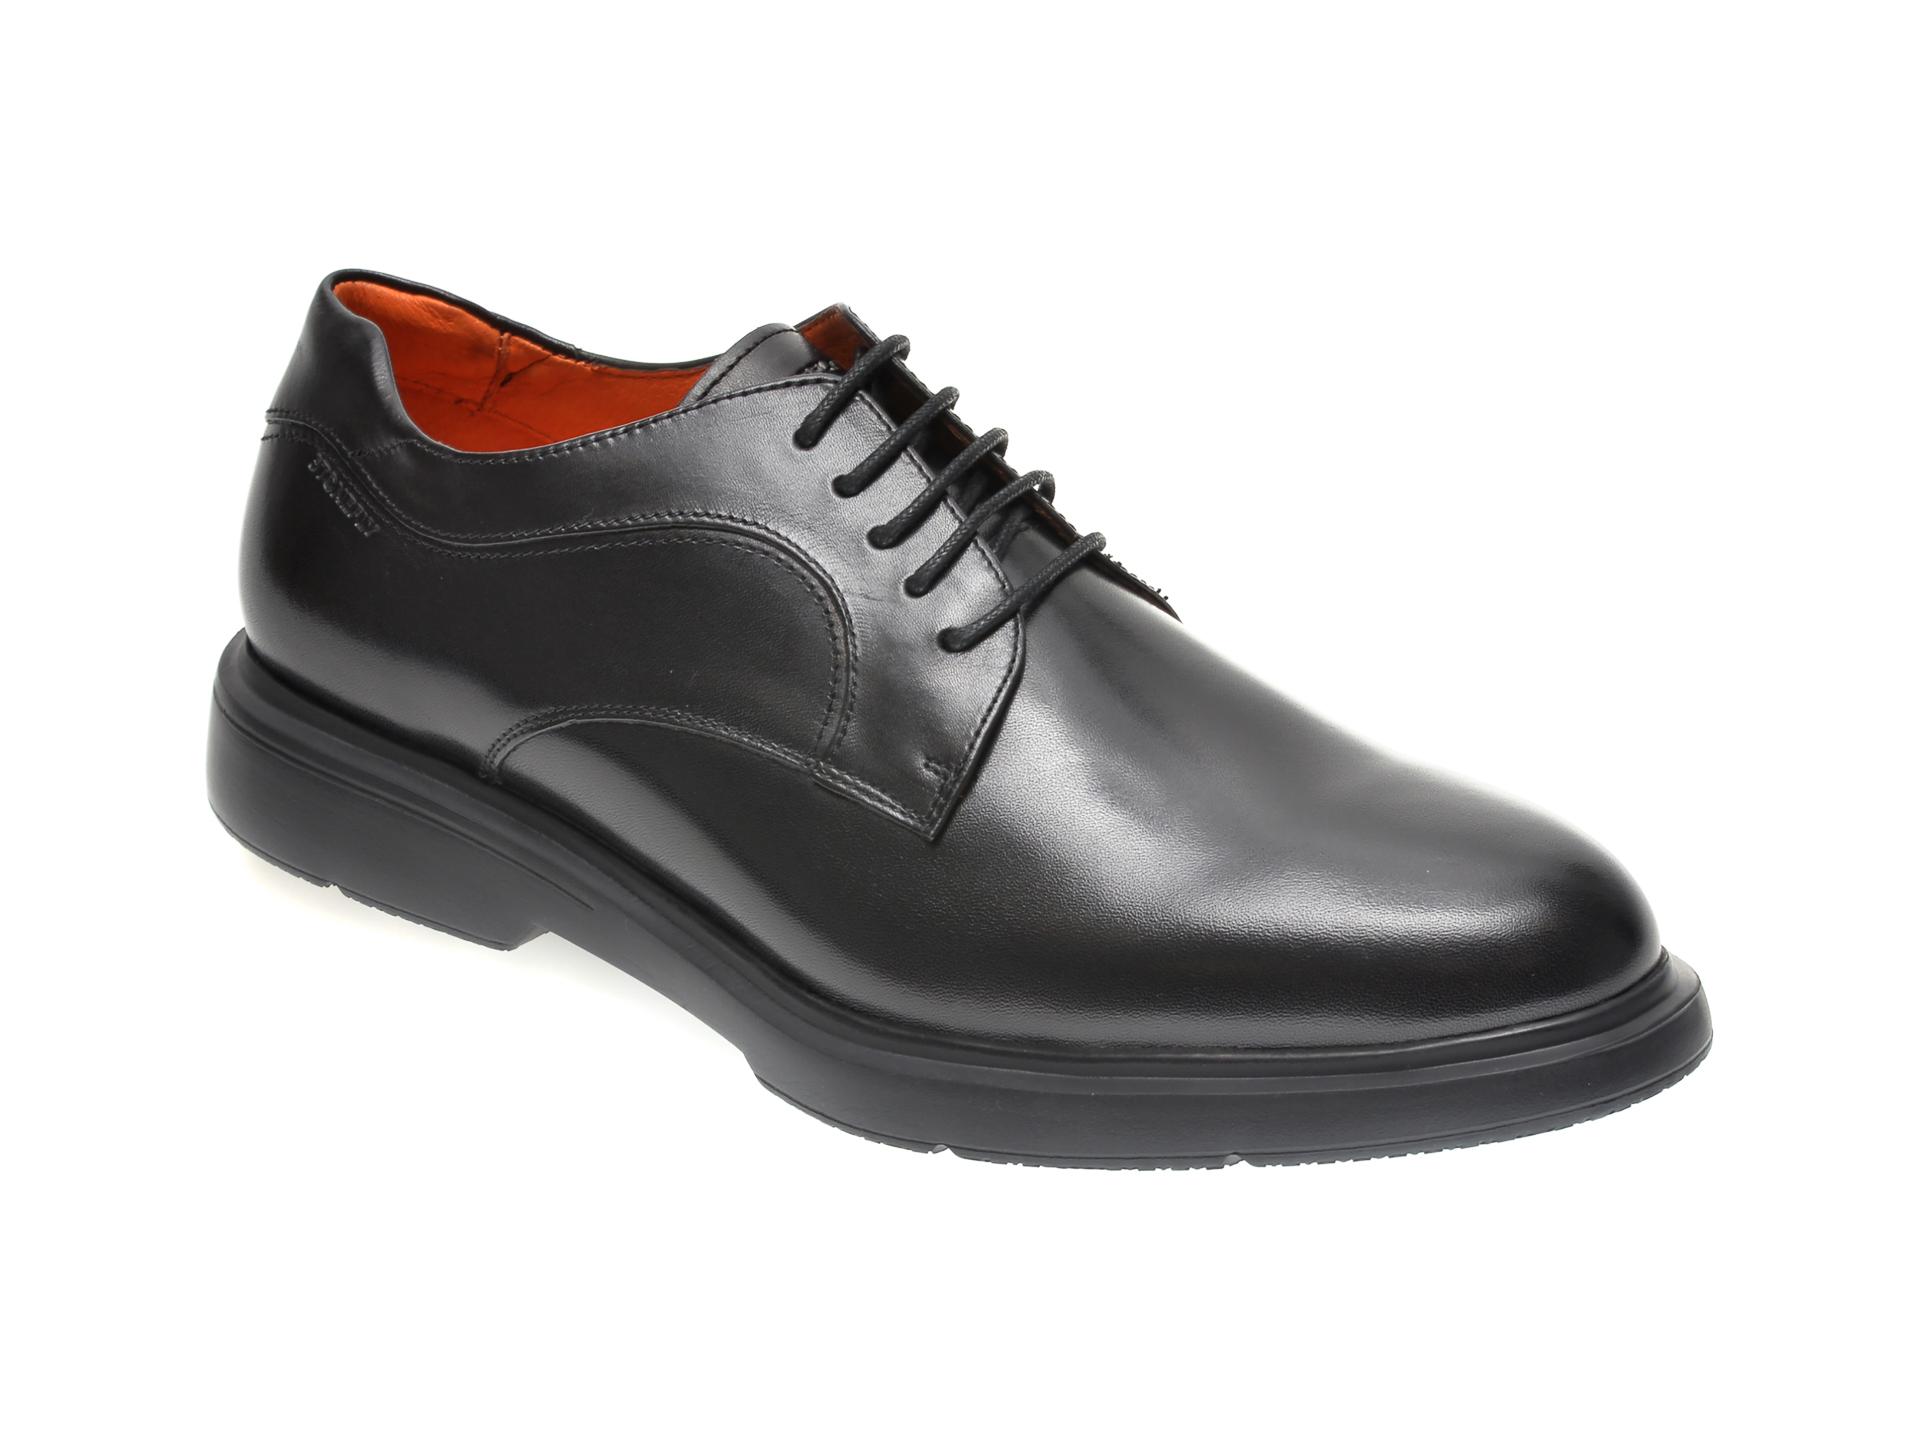 Pantofi STONEFLY negri, TRUMAN1, din piele naturala